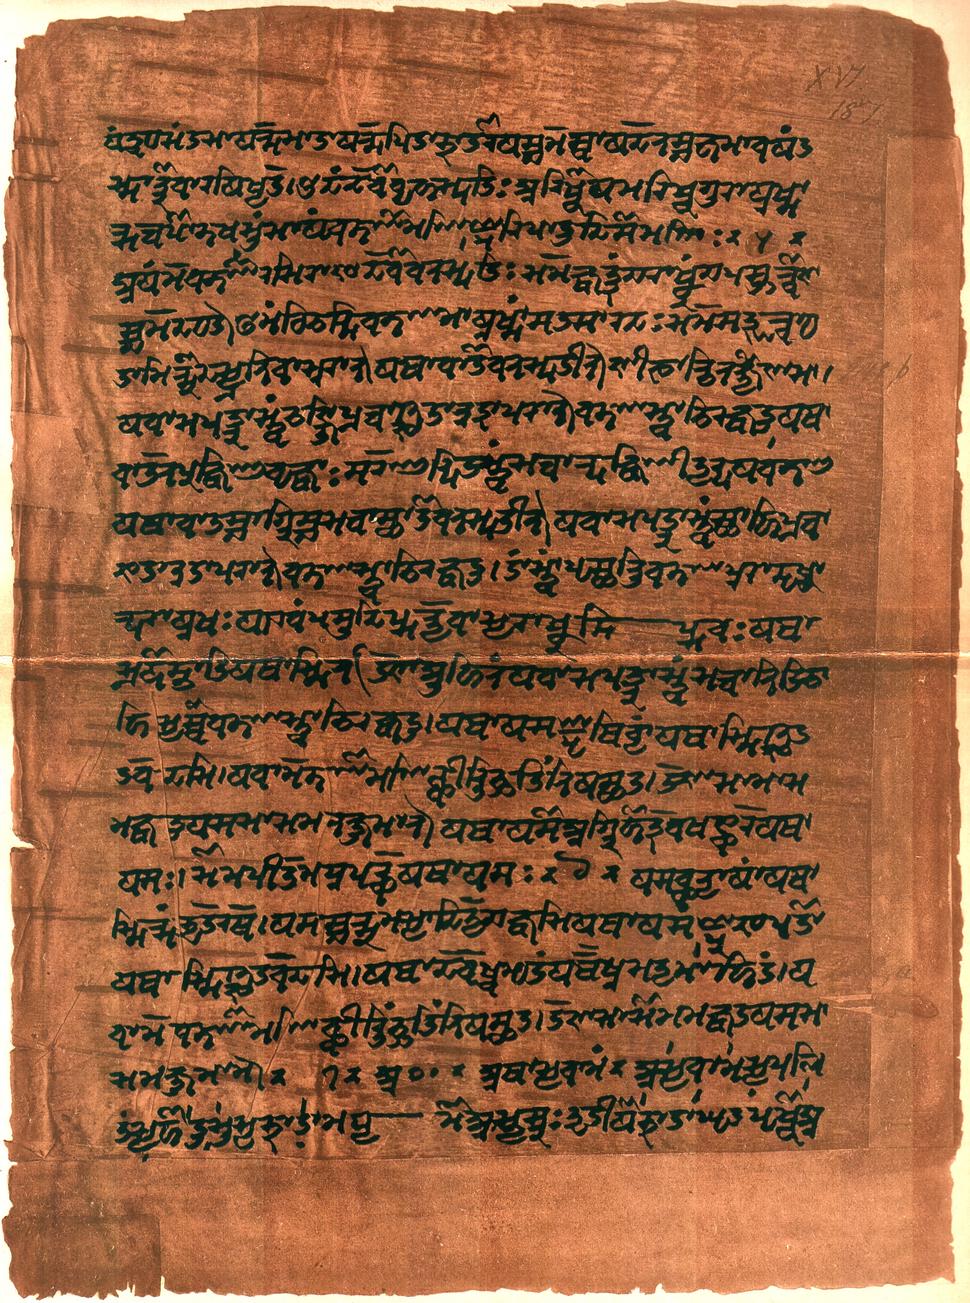 Atharva-Veda samhita page 471 illustration